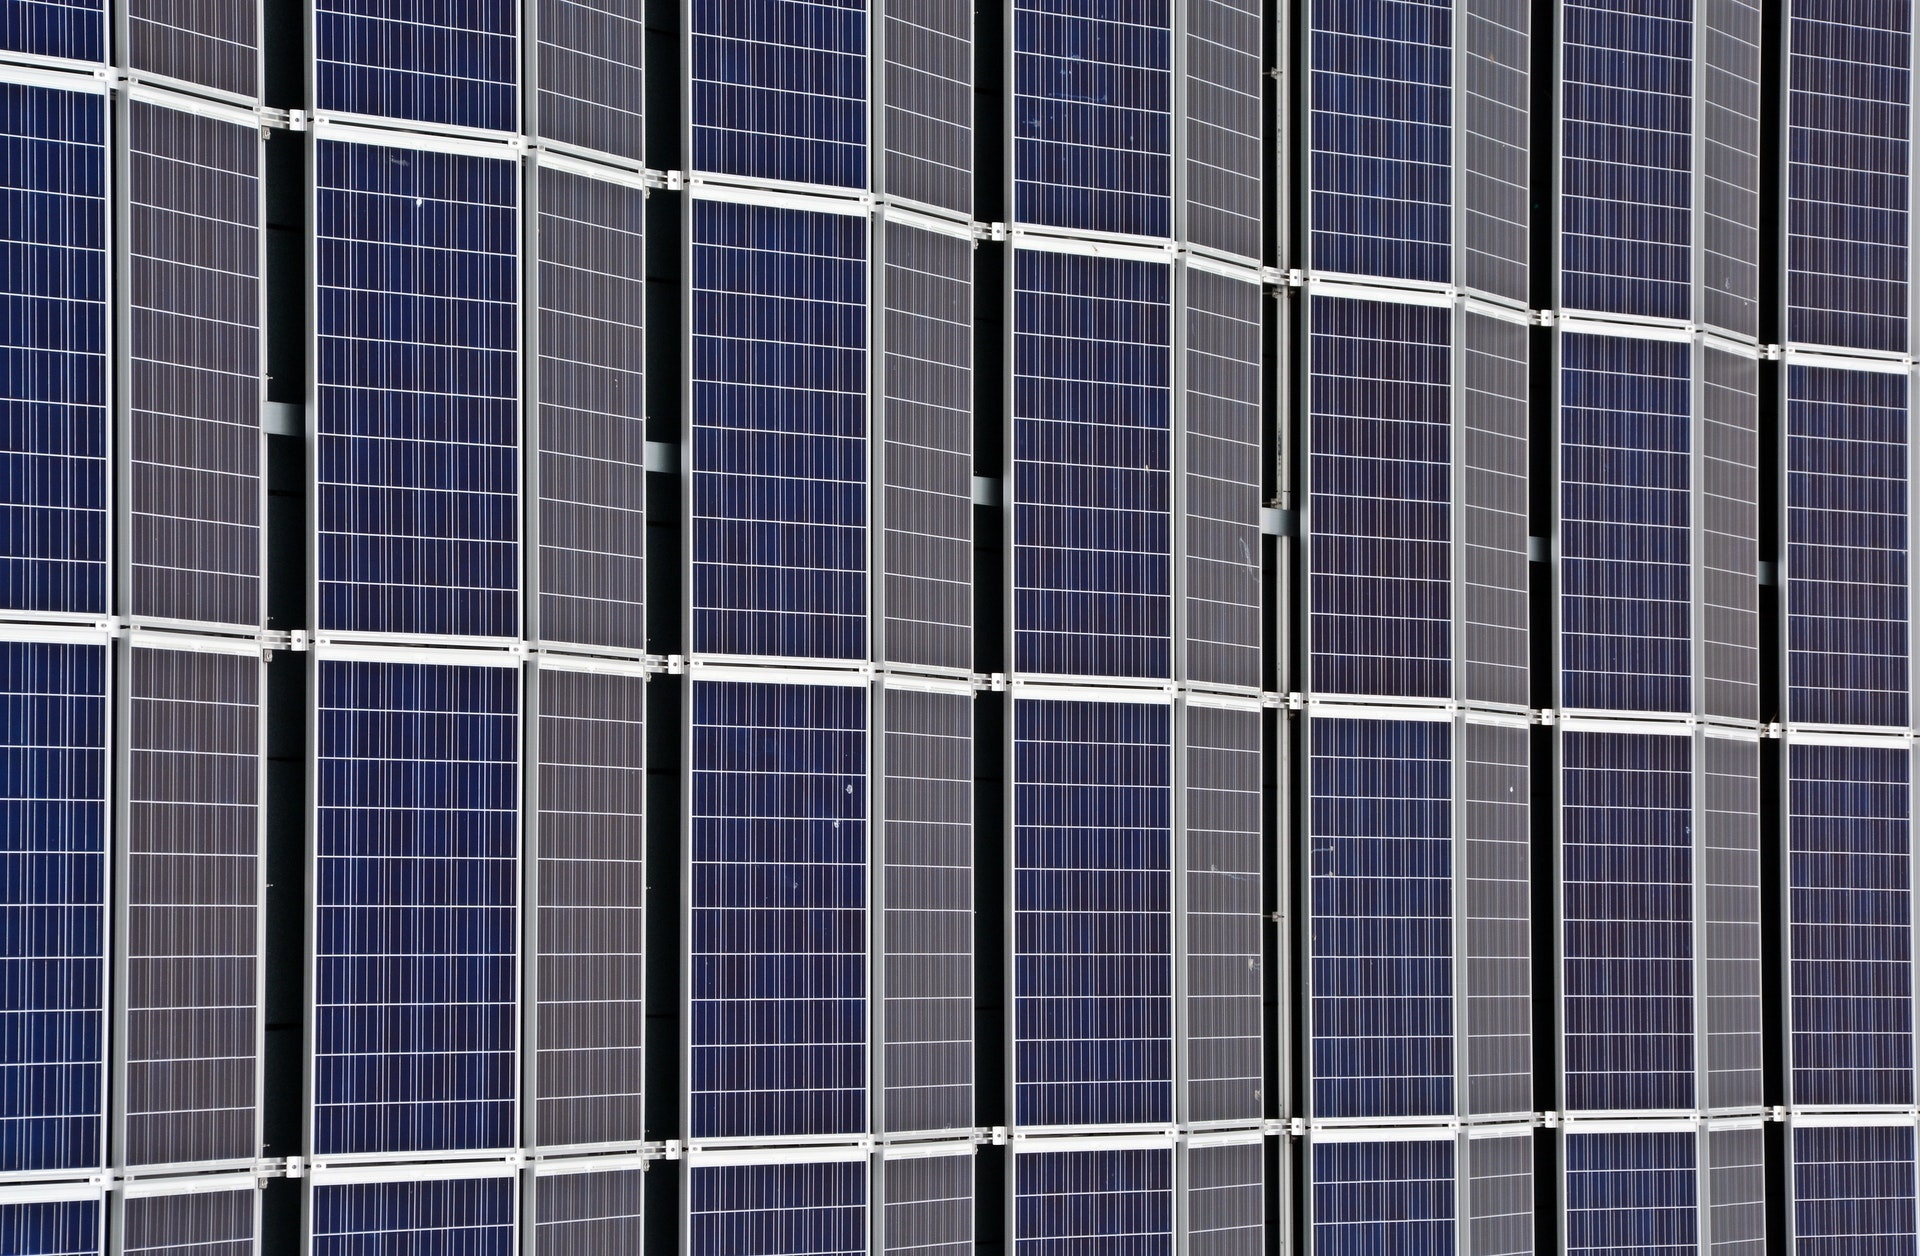 Large Solar Panel Array, Solar PV, Solar Energy, YSG Solar